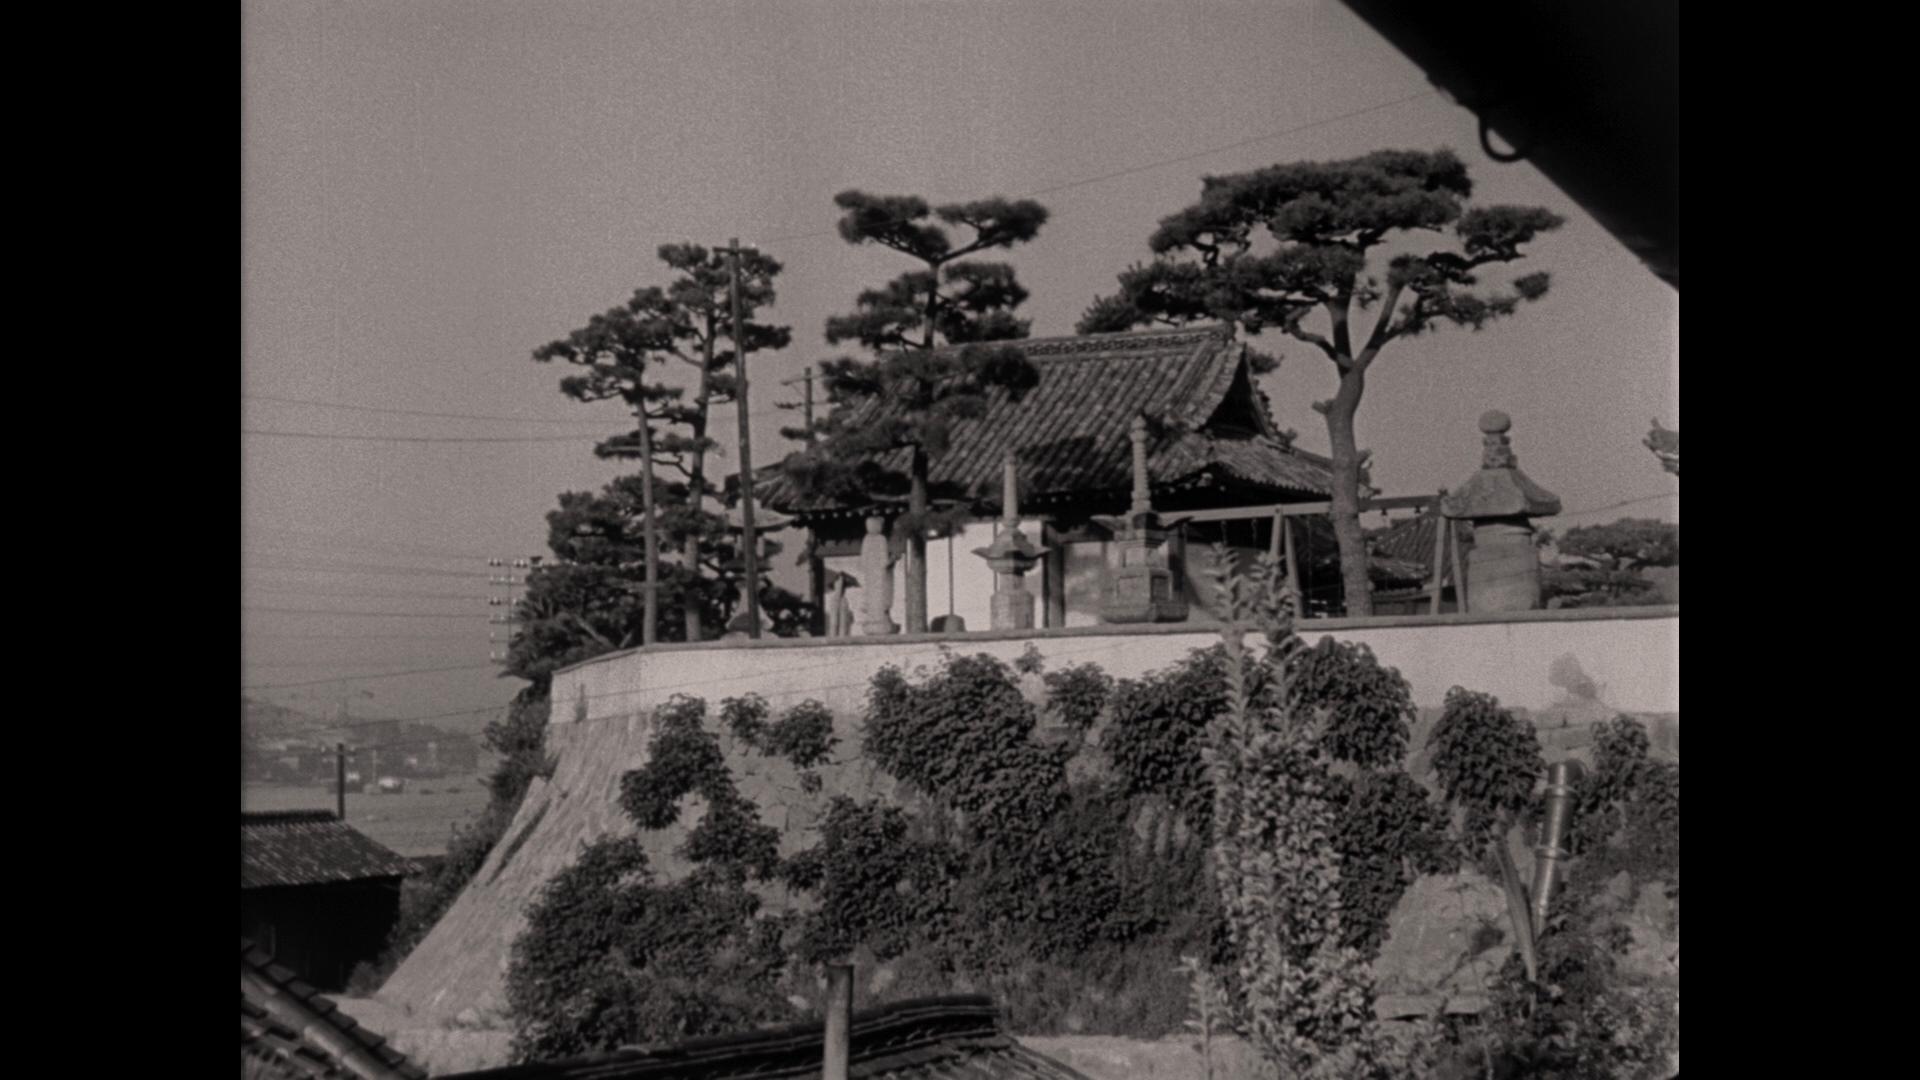 https://i0.wp.com/www.dvdbeaver.com/film4/blu-ray_reviews_59/tokyo_story_blu-ray_/large/large_tokyo_story_blu-ray_03x.jpg